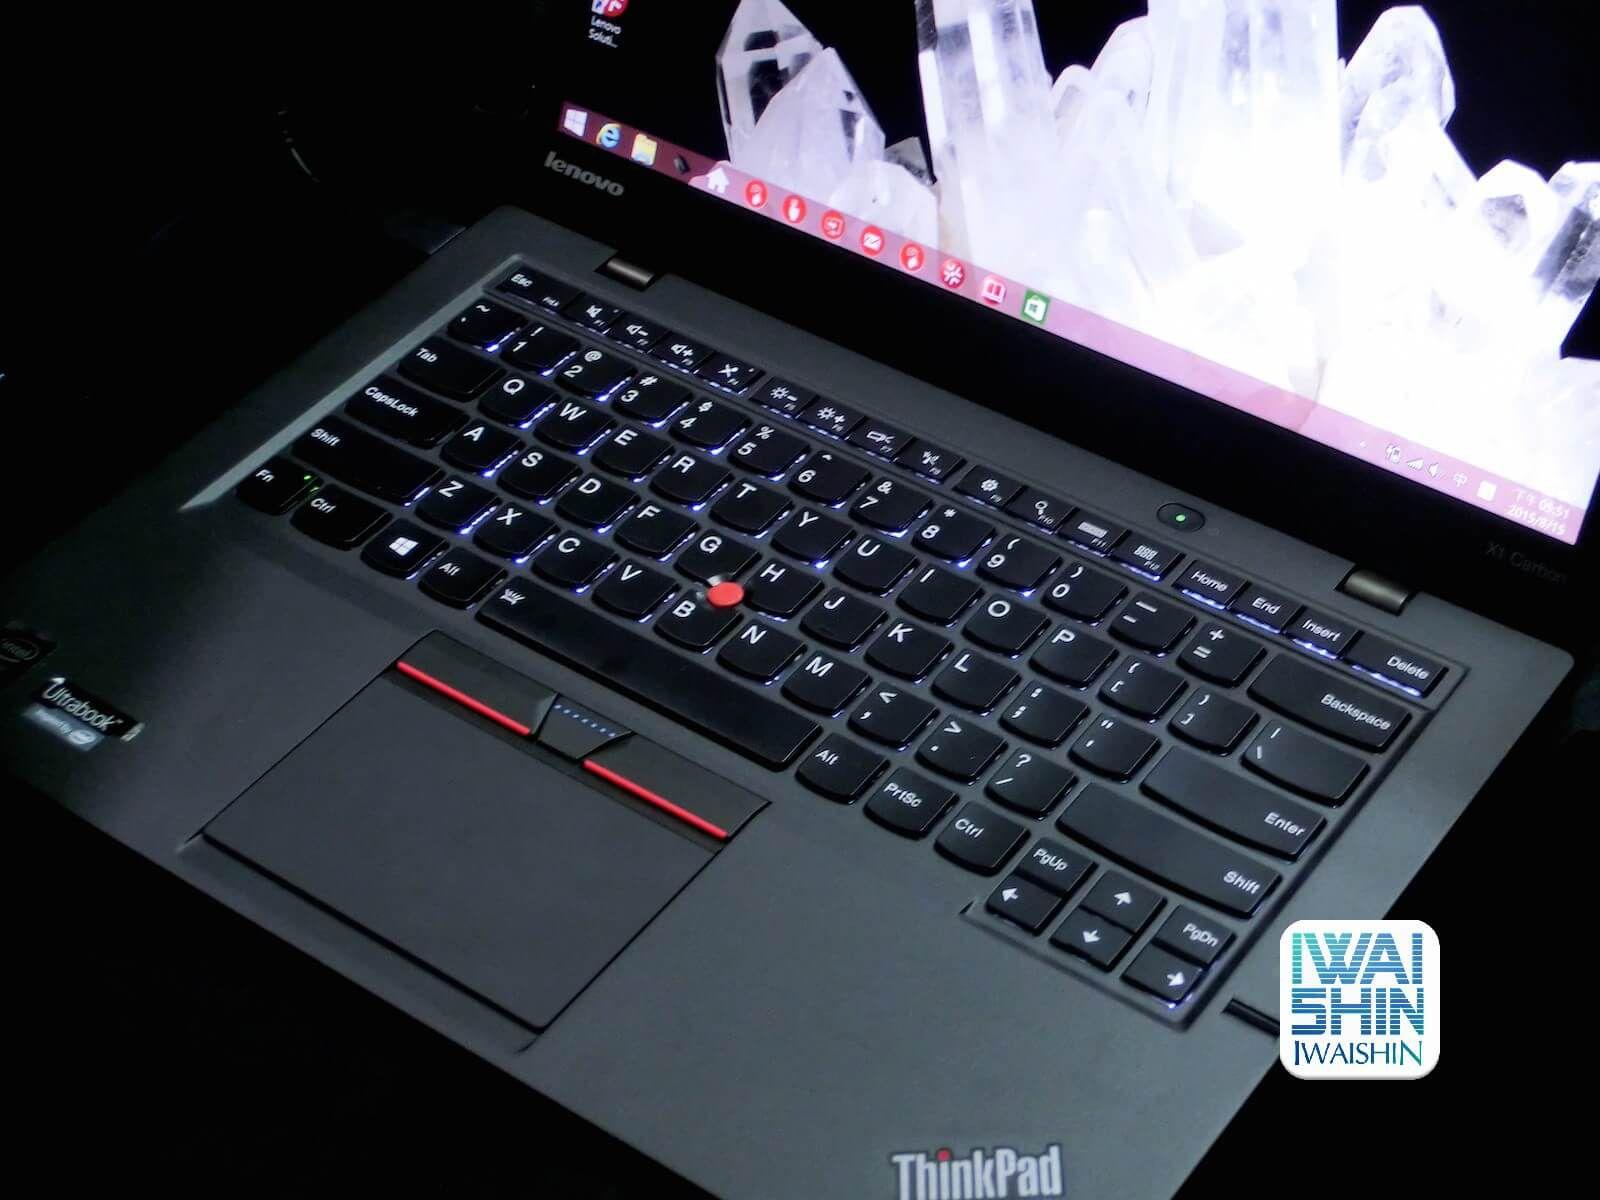 Lenovo ThinkPad x1 Carbon938